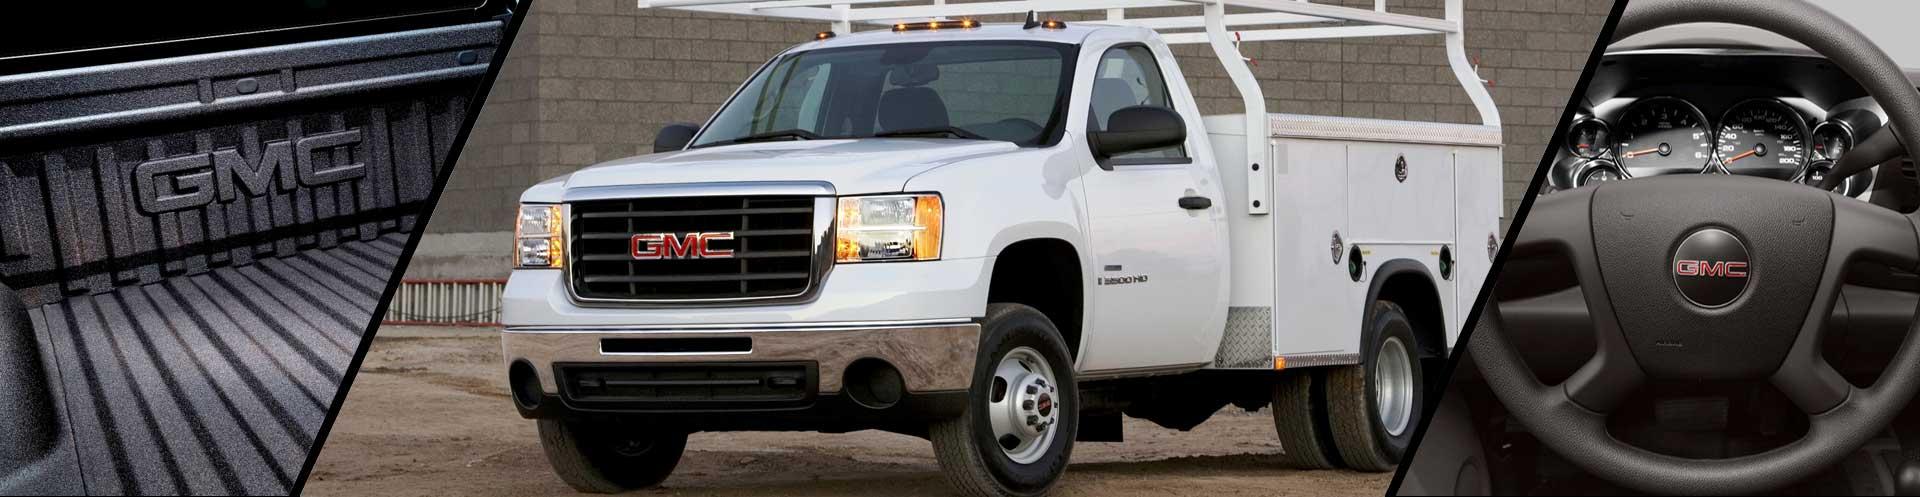 Used Trucks For Sale In Arkansas >> Benton Truck Sales Car Dealer In Benton Ar